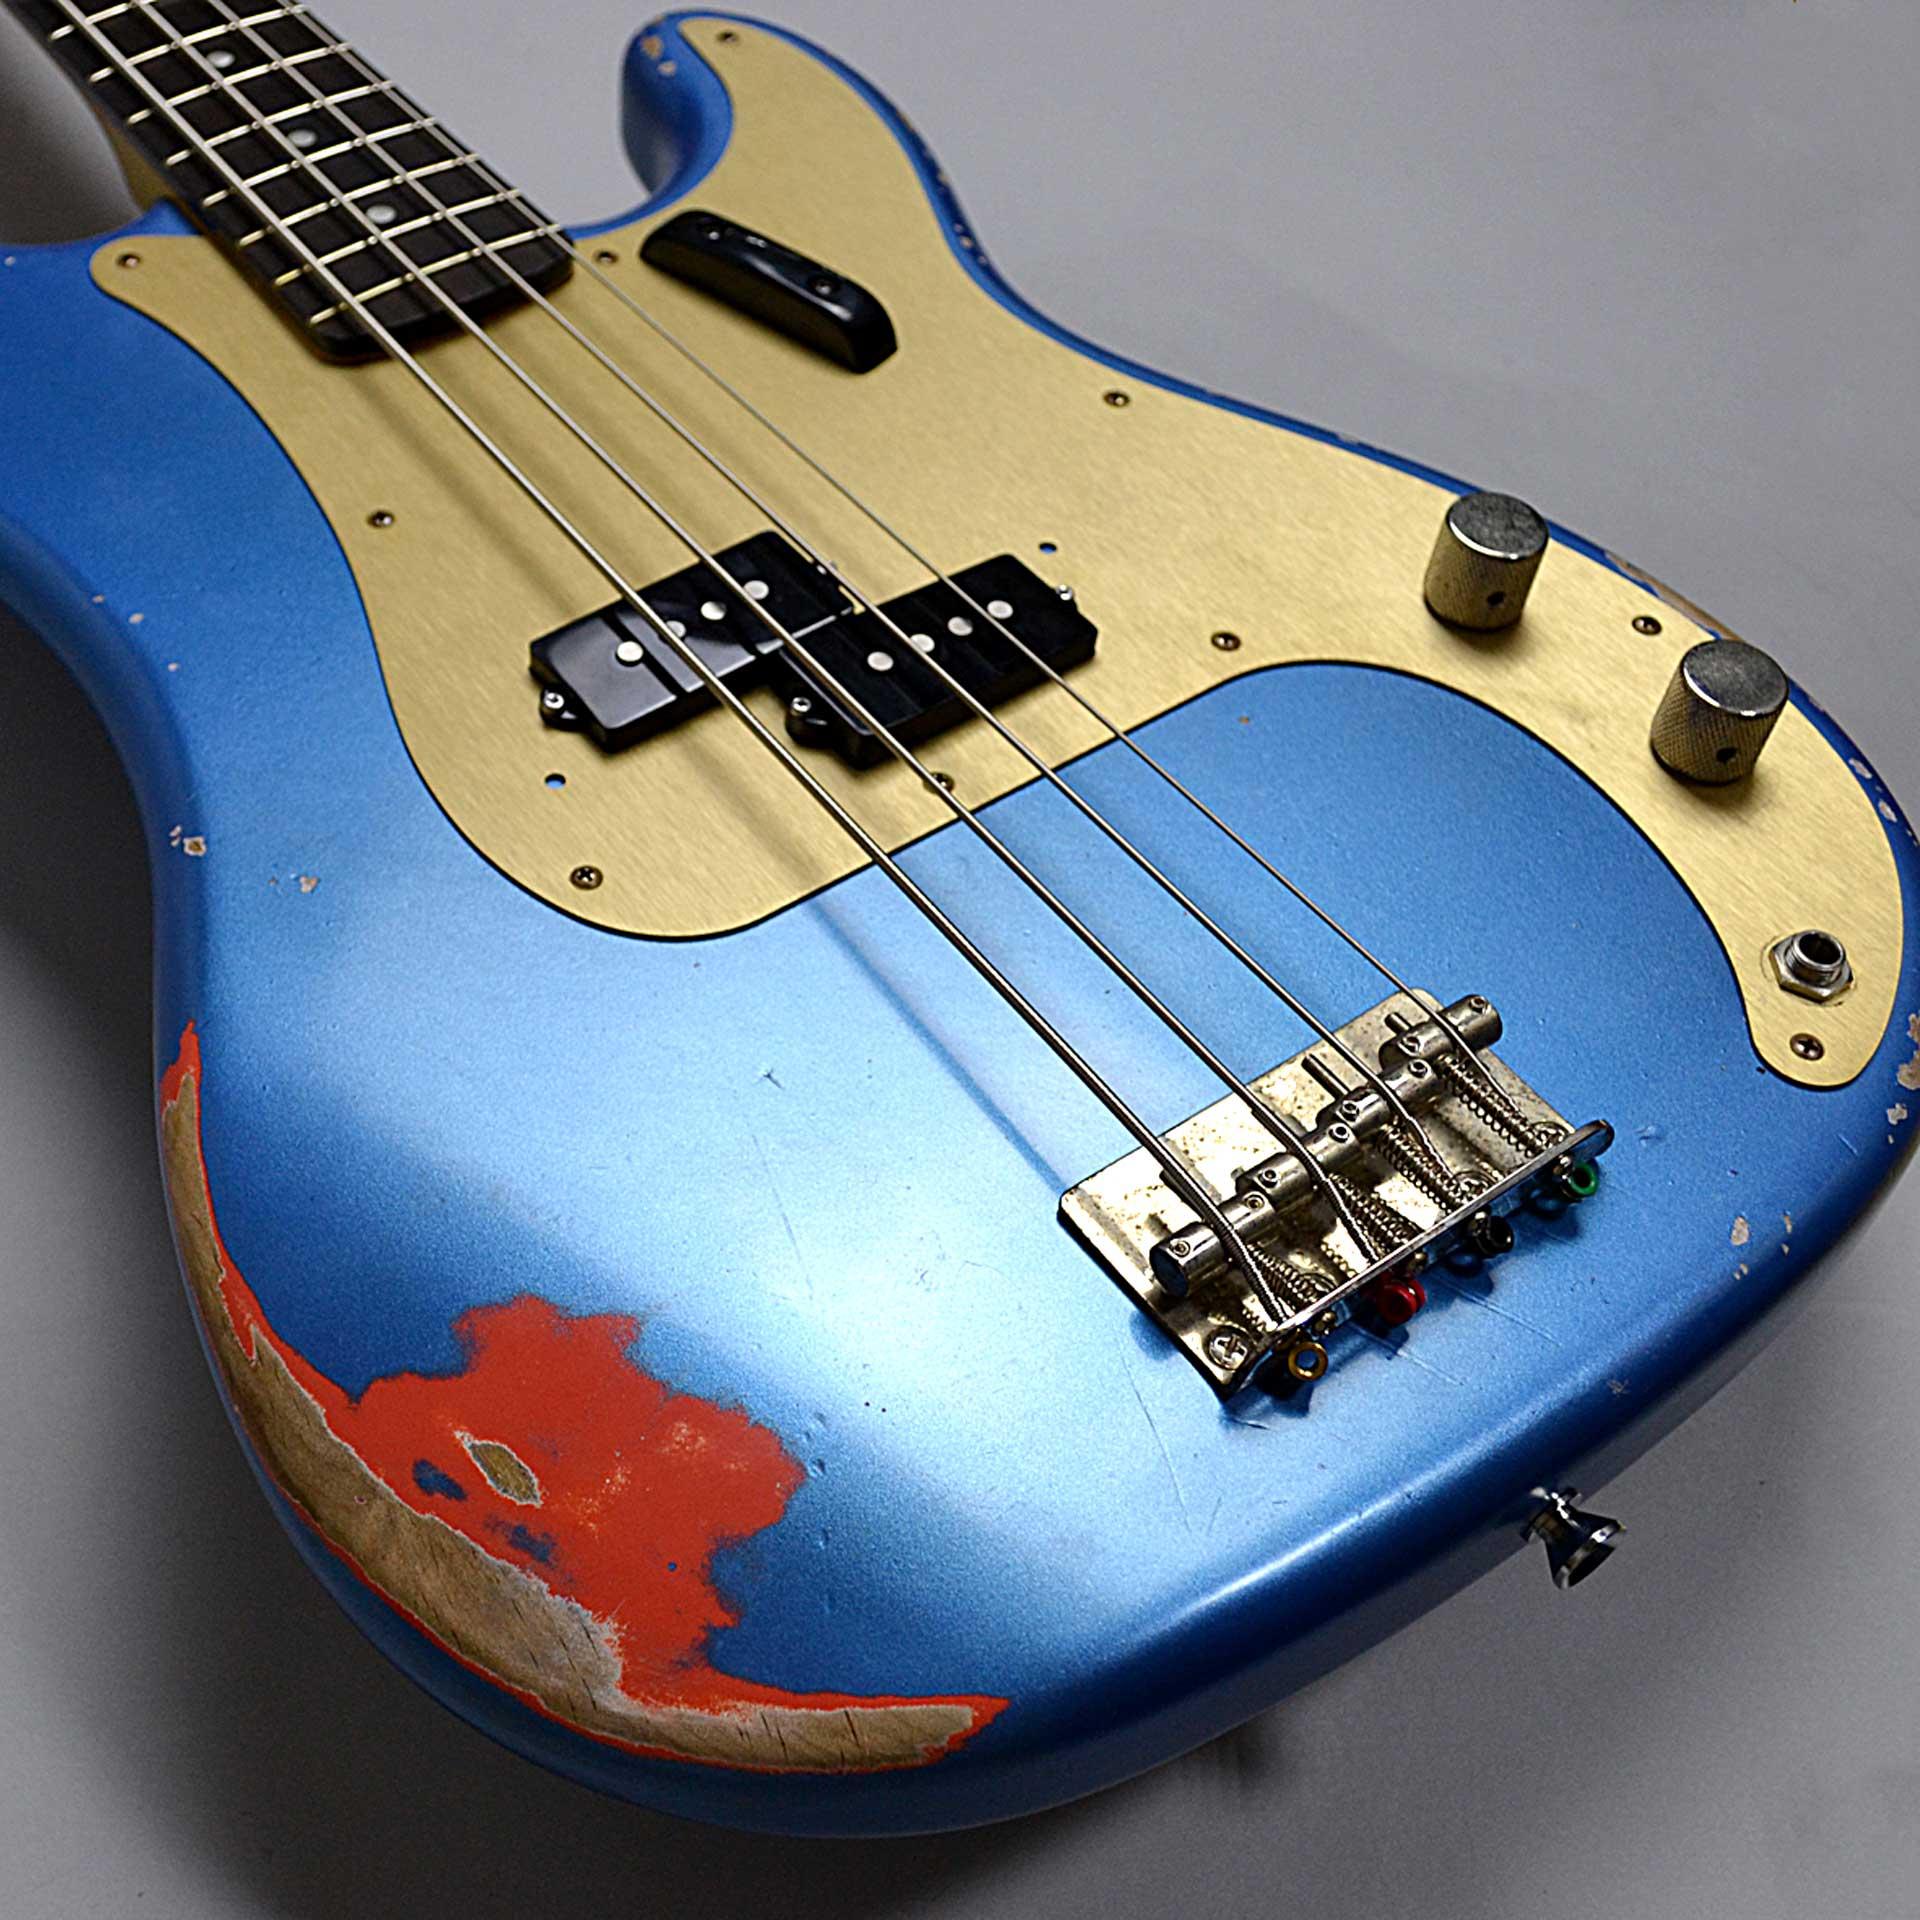 P-BASS/Lake Placid Blue over Fiesta Red/Alder/Rose/Midium Agedのボディバック-アップ画像